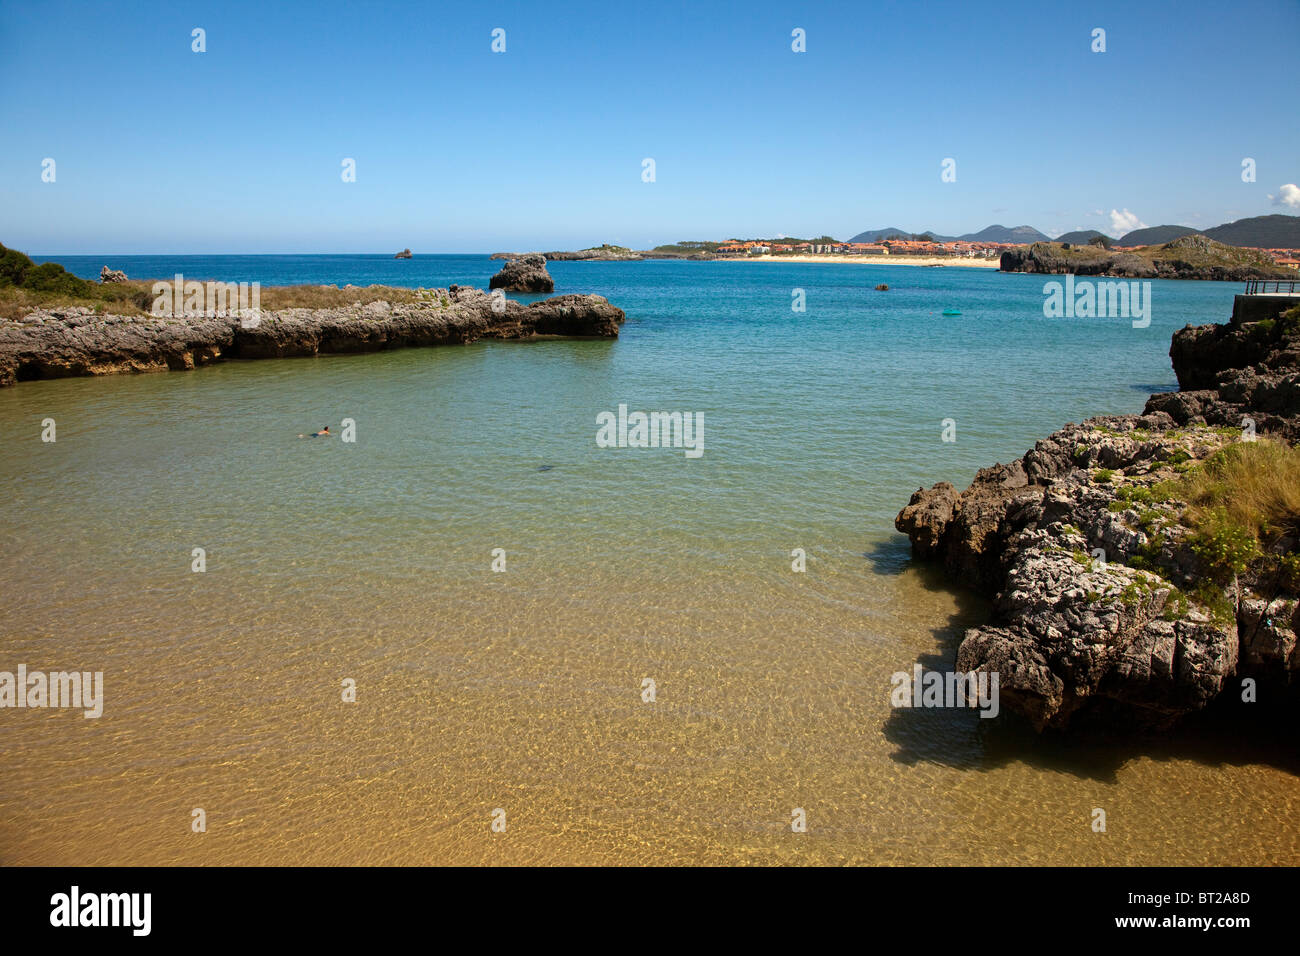 Playa de El Sable Isla Cantabria España Sable beach isla Cantabria Spain - Stock Image